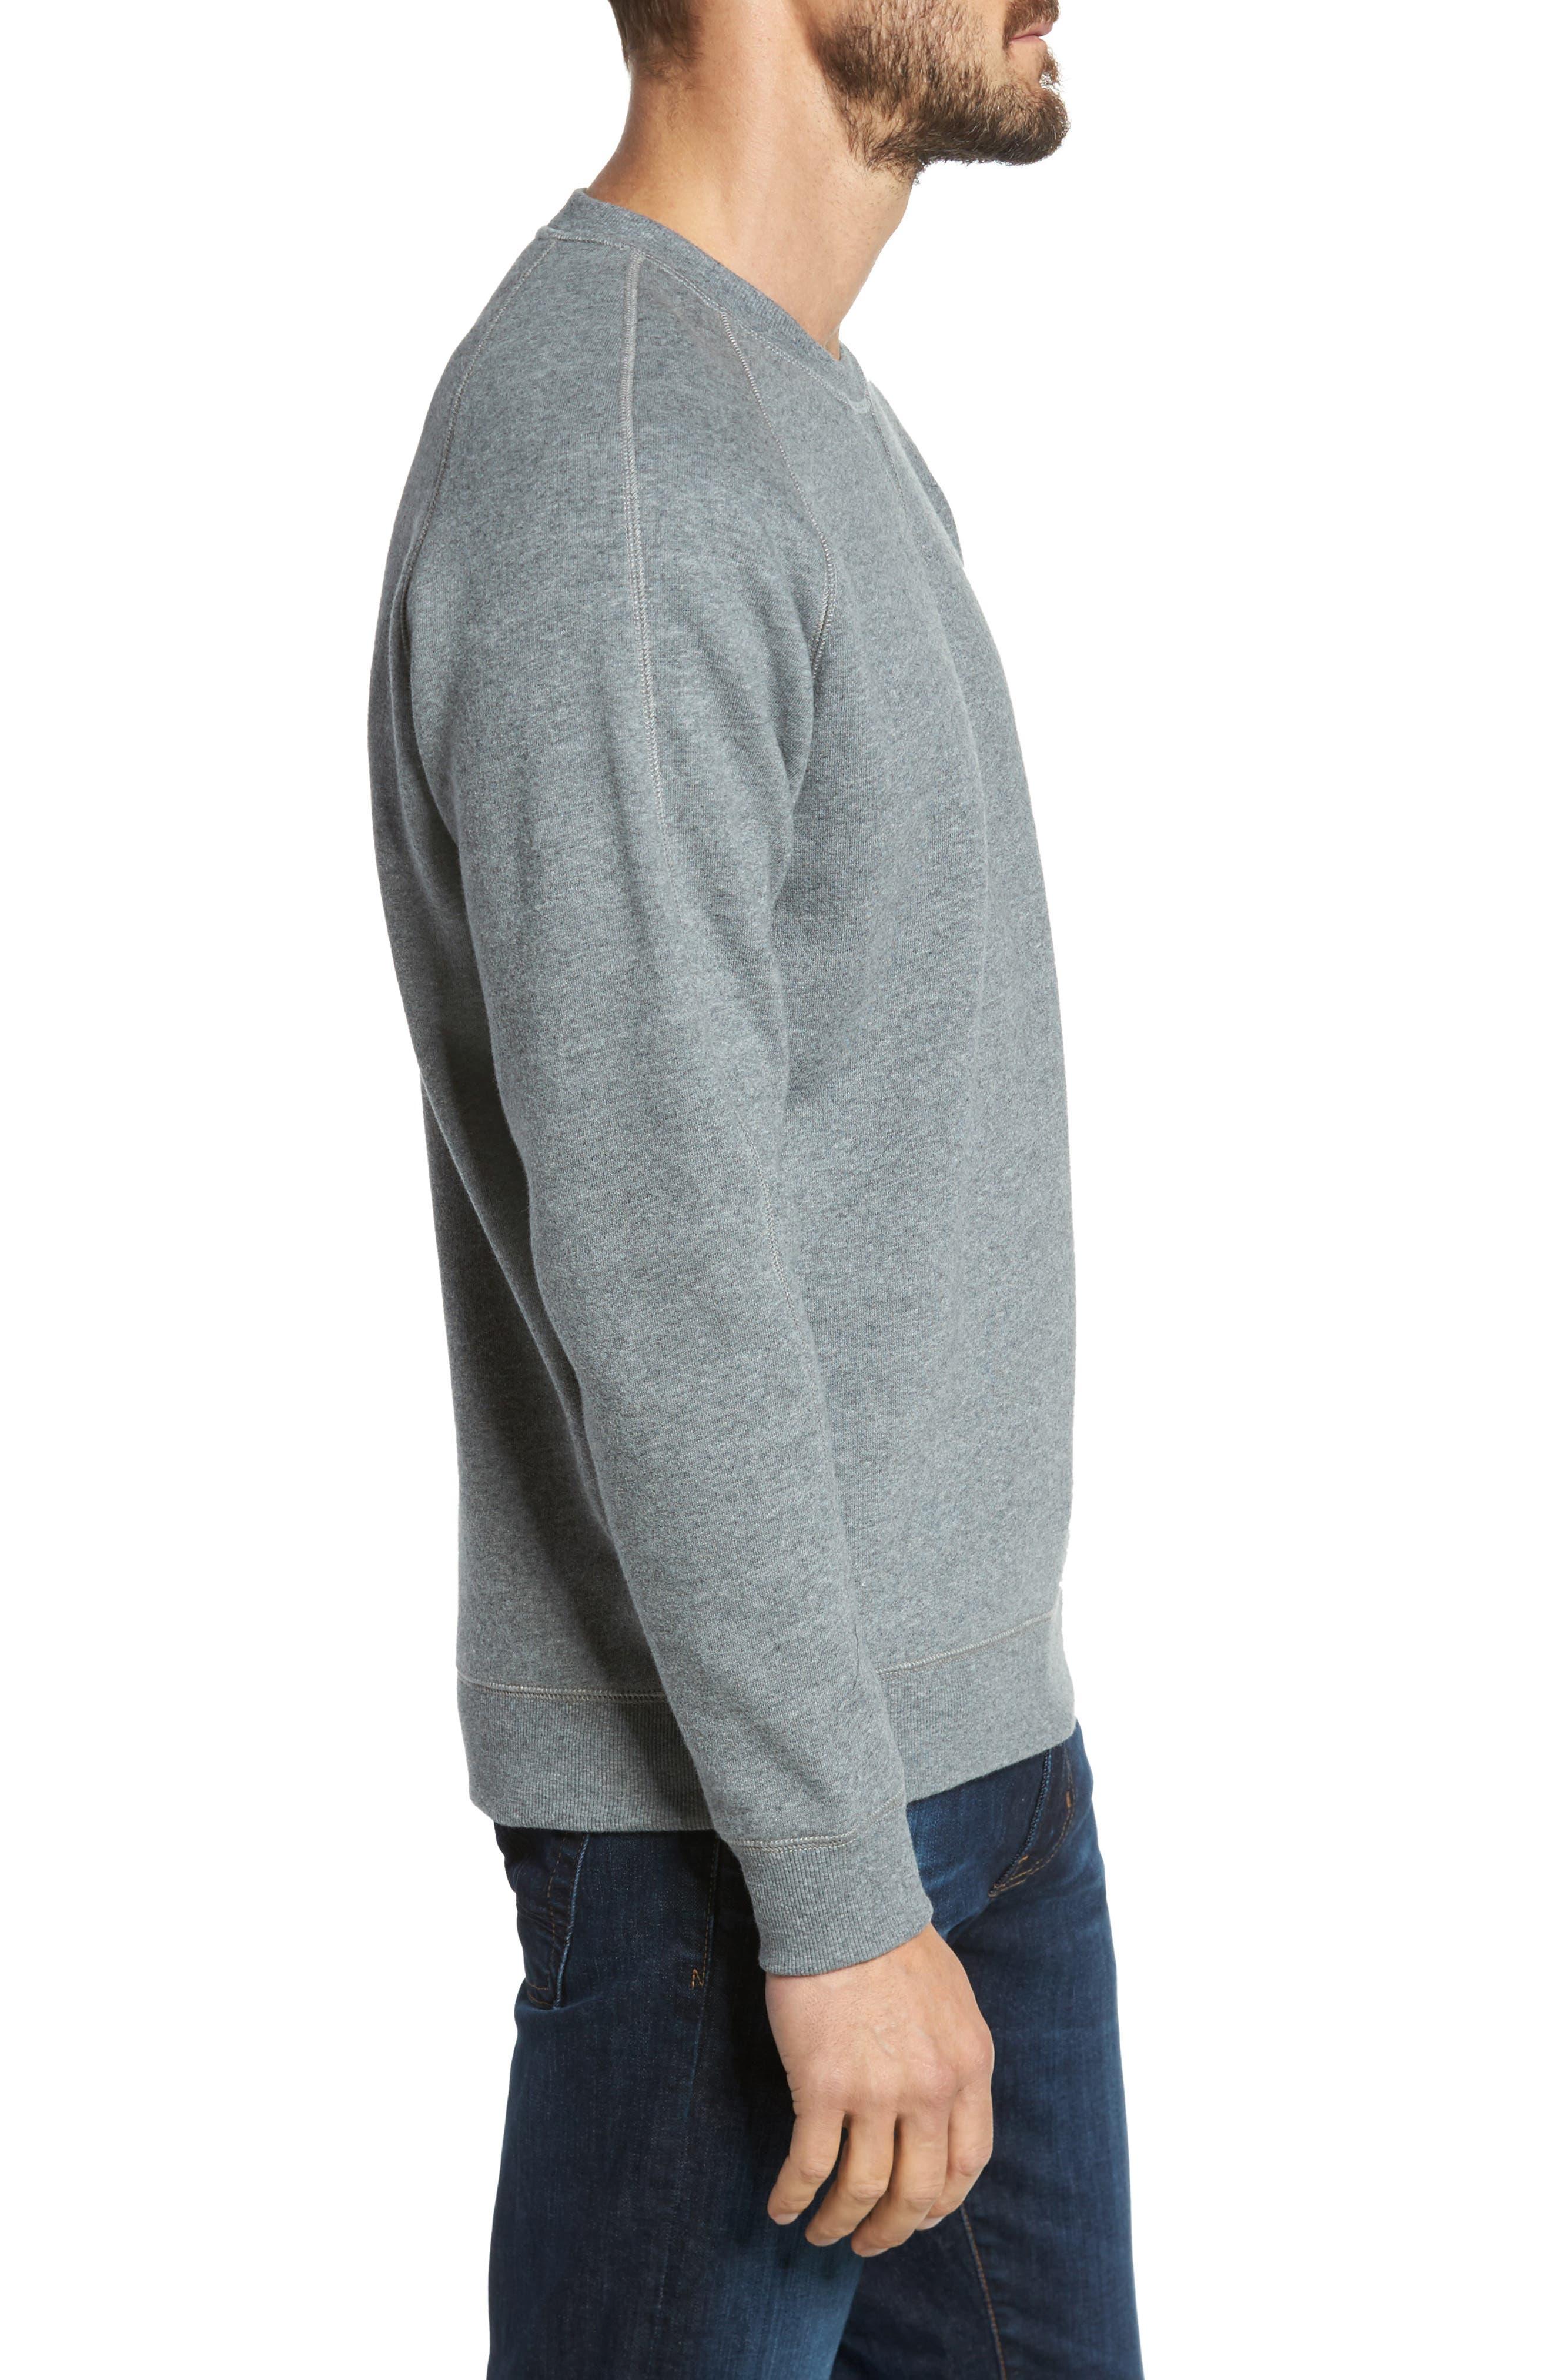 Fleece Sweatshirt,                             Alternate thumbnail 3, color,                             Grey Paloma Heather